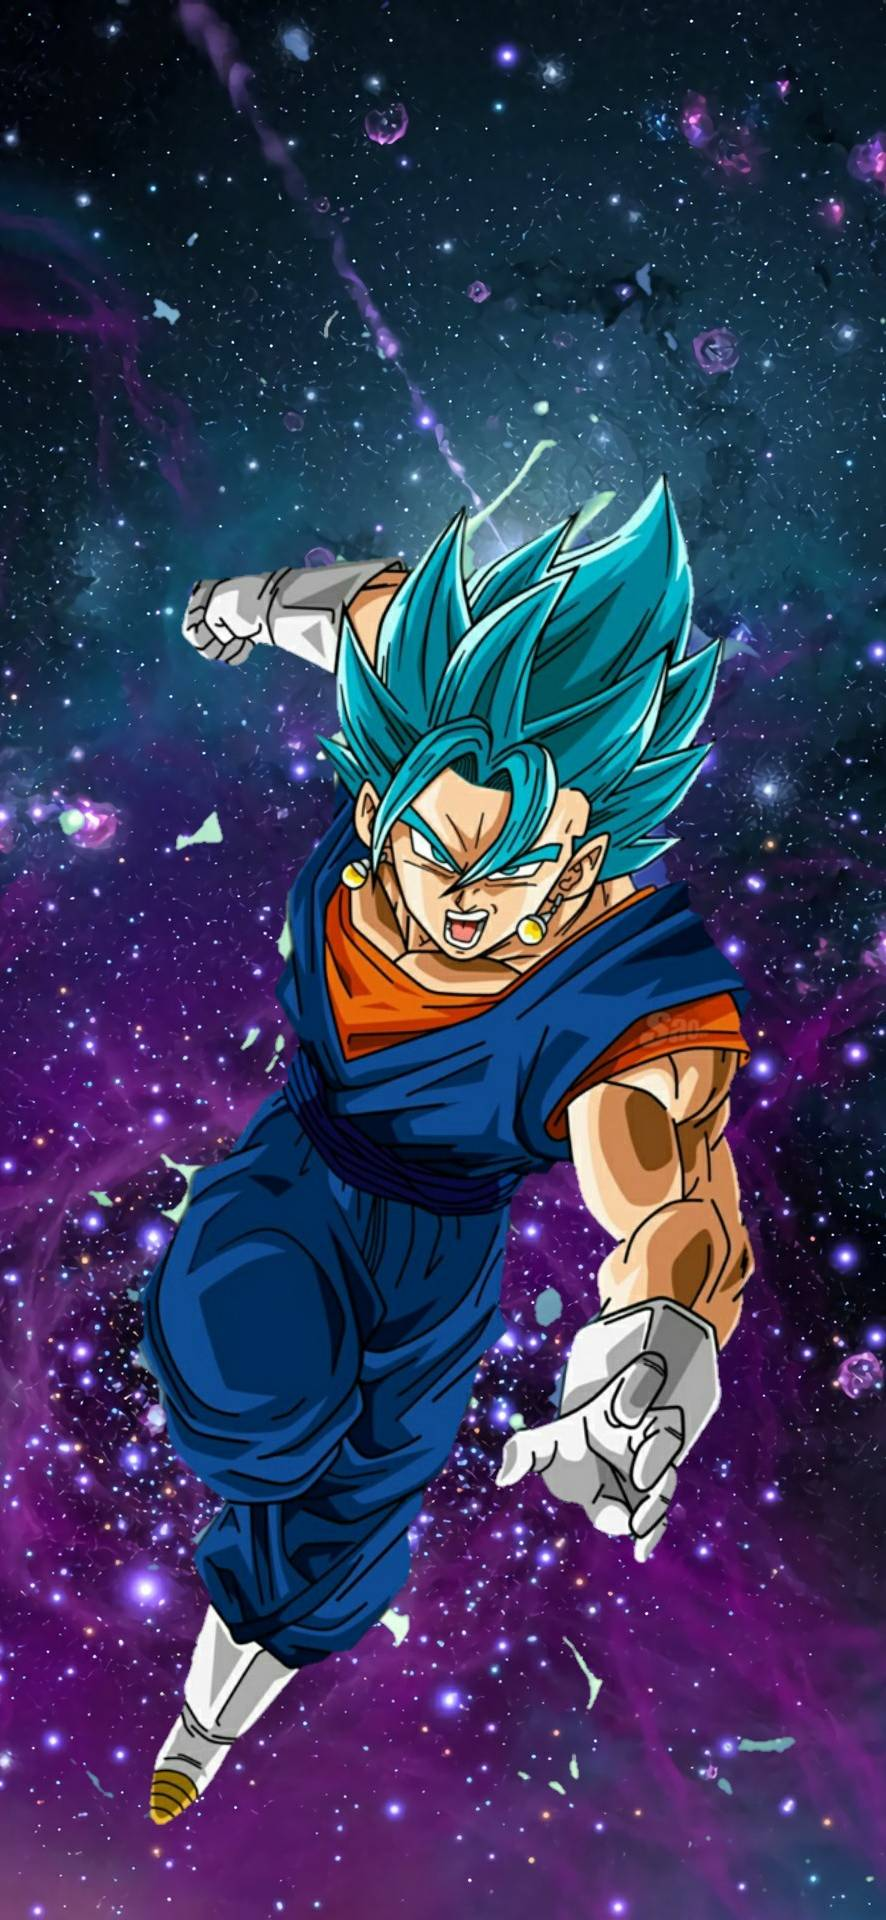 Goku 4k Wallpaper Phone Sfondi Dragon Ball Iphone X 886x1920 Wallpaper Teahub Io